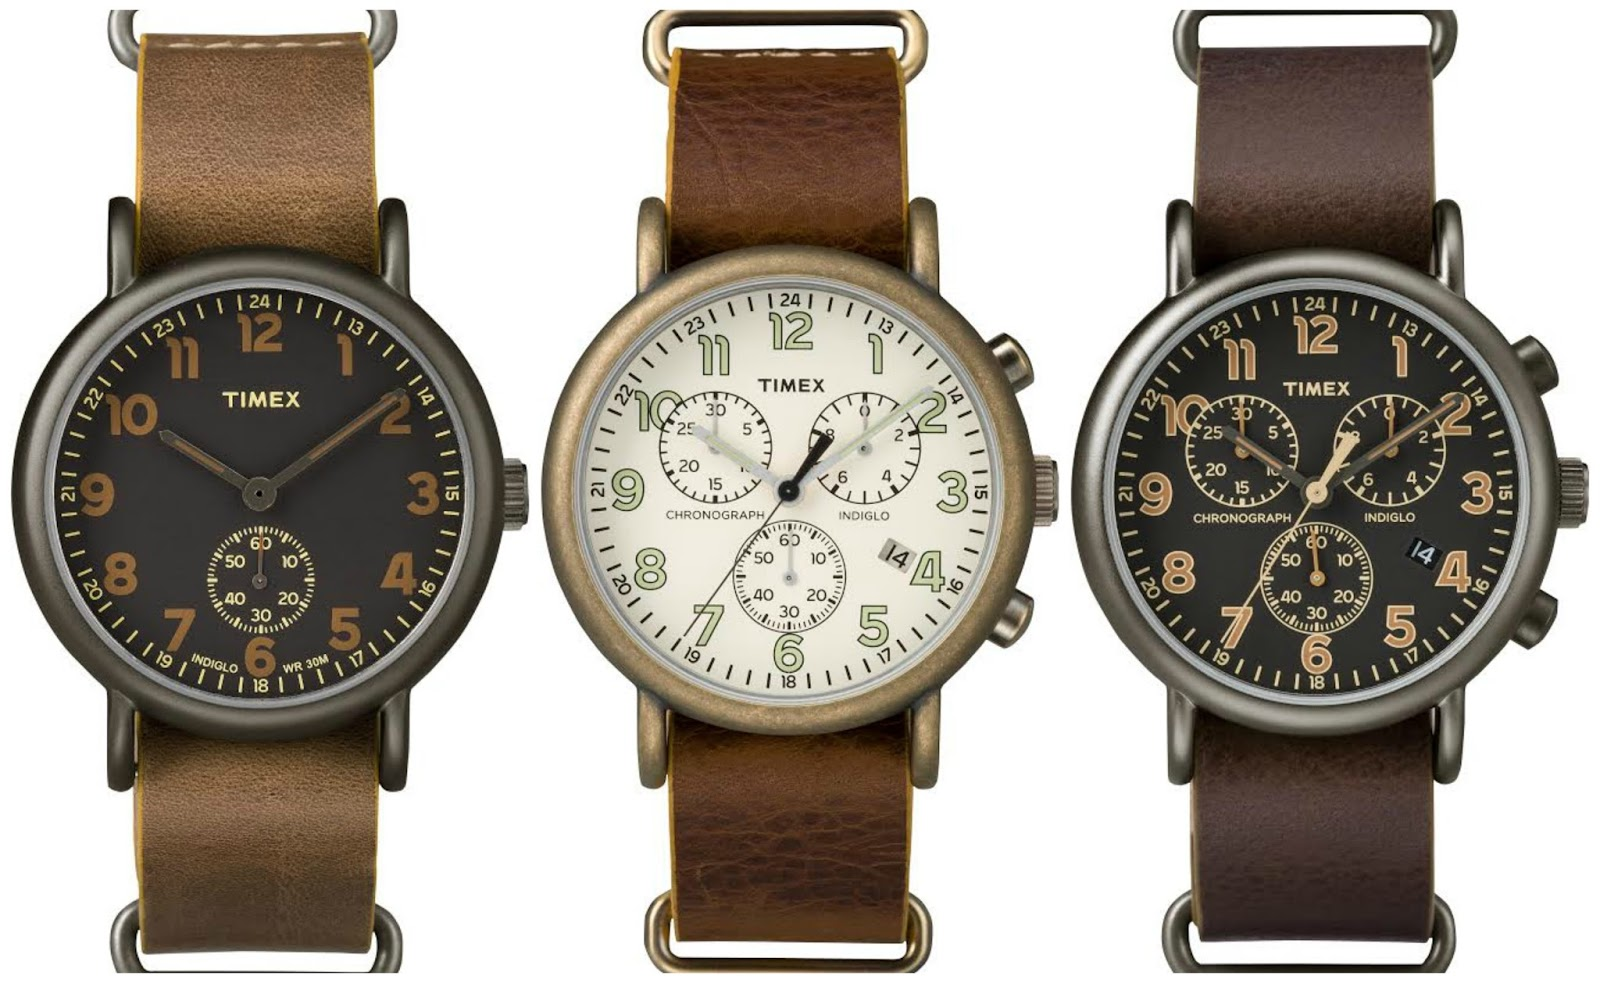 6319d491907 Sabiam que o relógio de pulso foi inspirado no relógio de bolso  E sabiam  que ganhou maior destaque durante a I Guerra Mundial